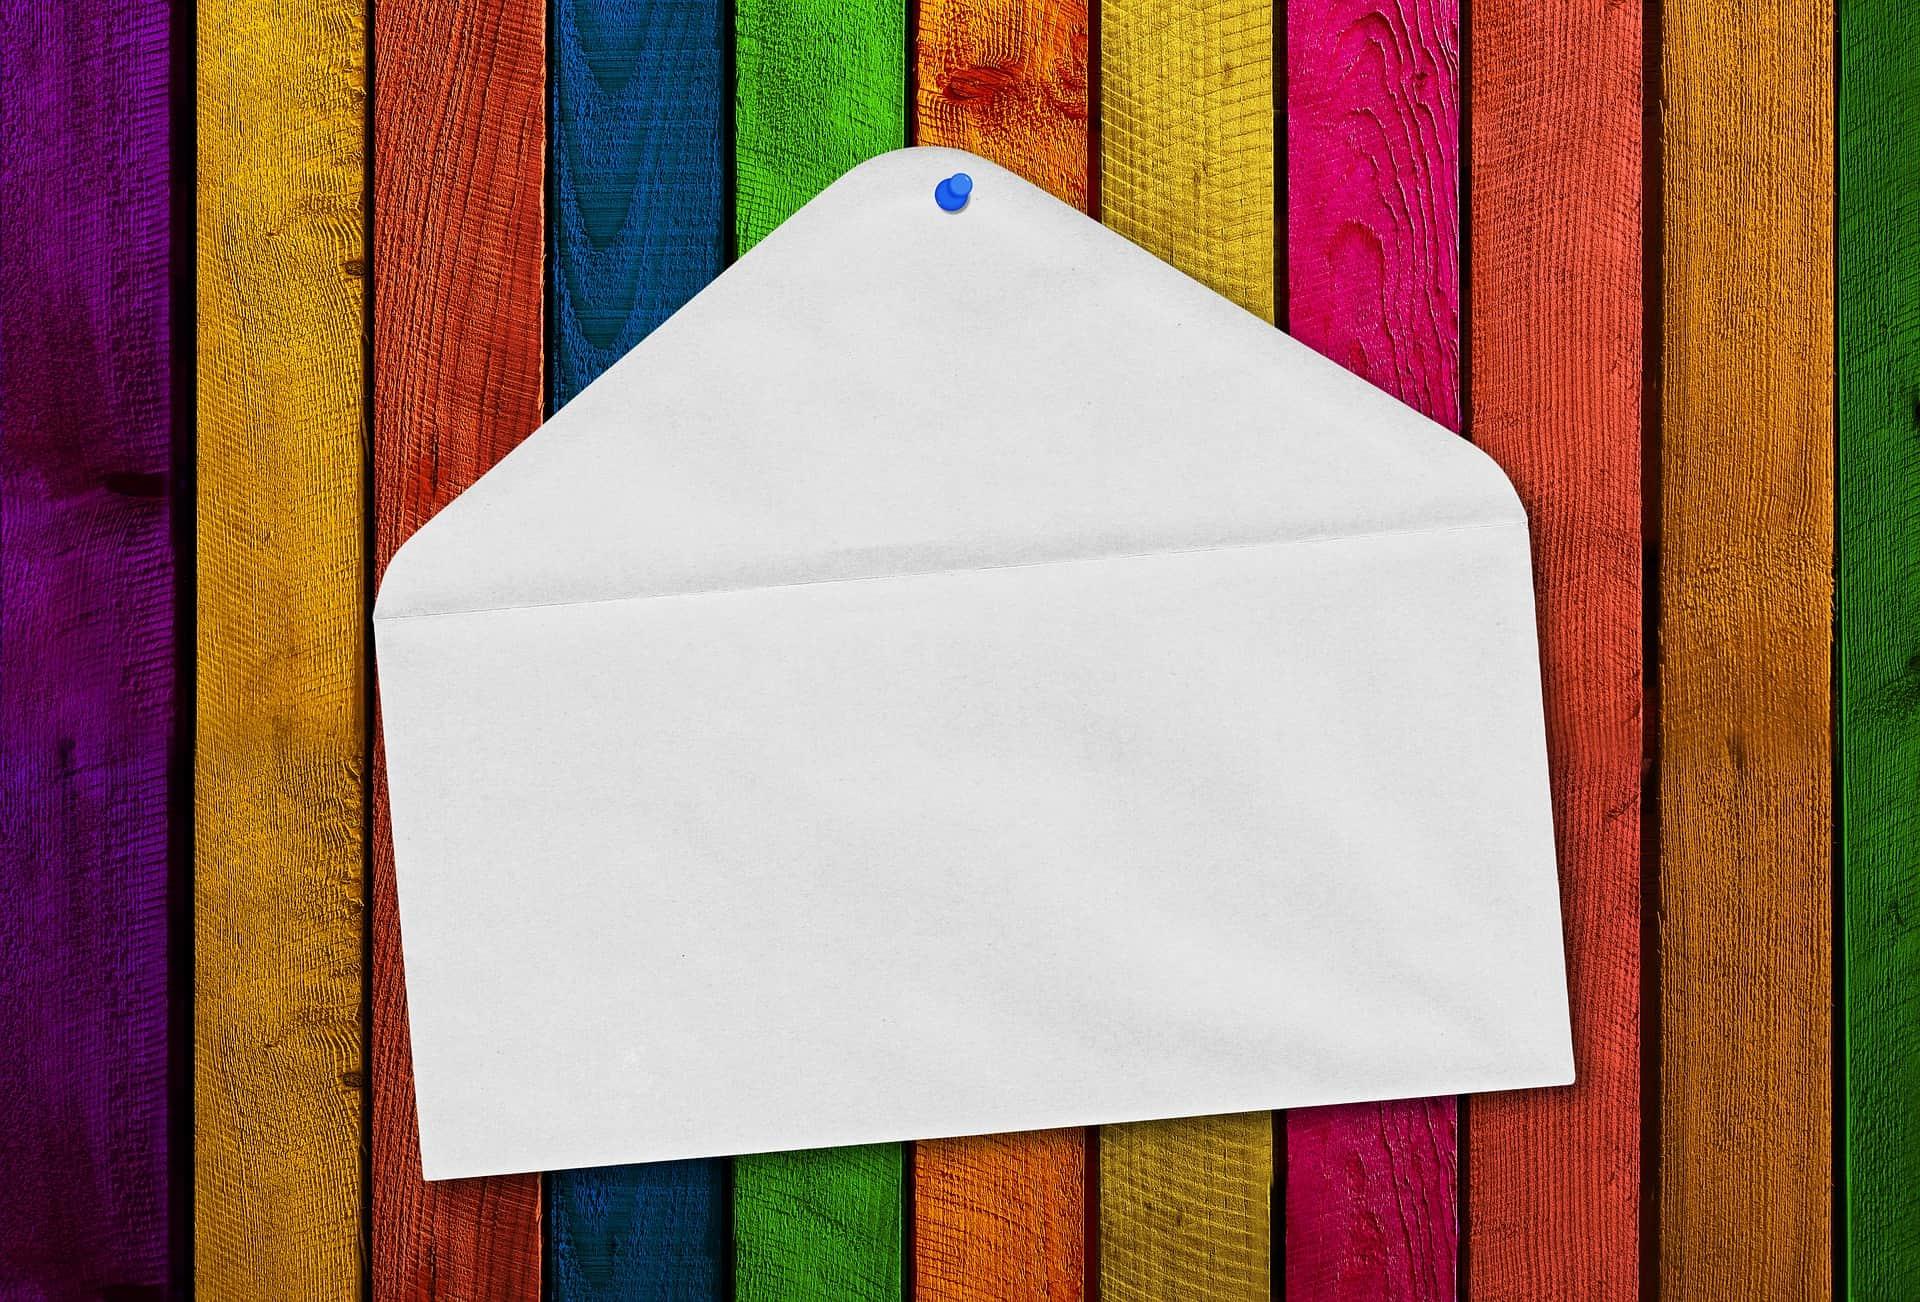 brag sheet example